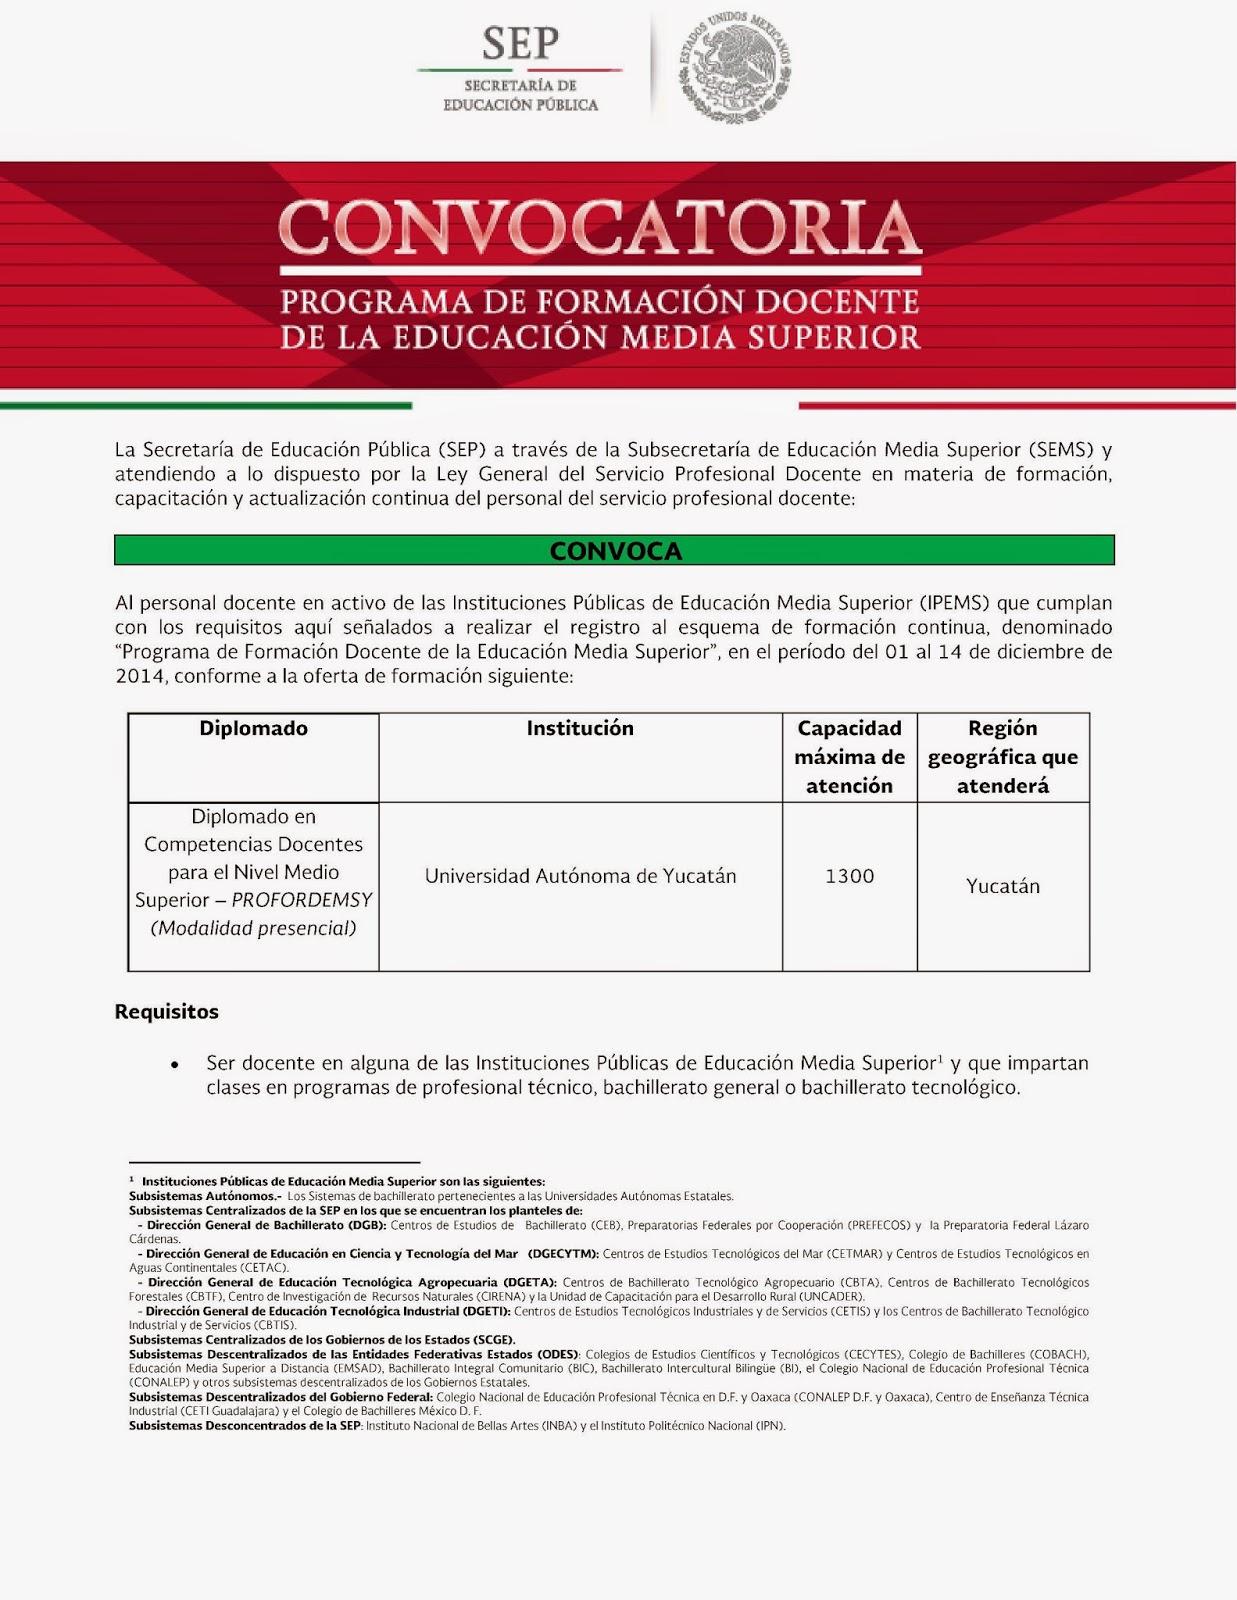 Cobay kinchil convocatoria para diplomado en competencias for Convocatoria para docentes